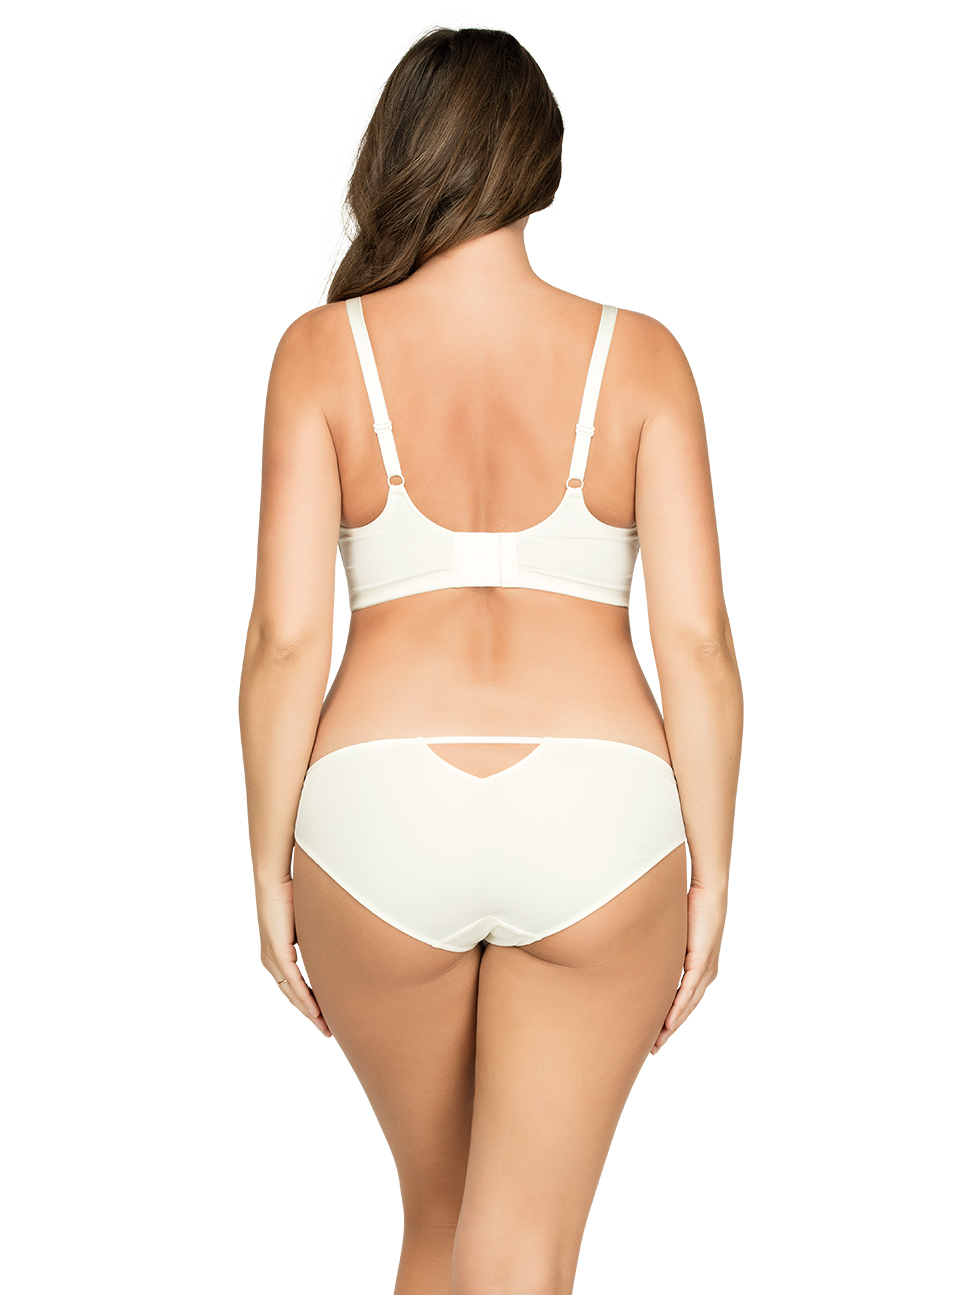 PARFAIT Ciara BraletteP5711 BikiniP5713 Ivory Back - Ciara Bralette Ivory P5711